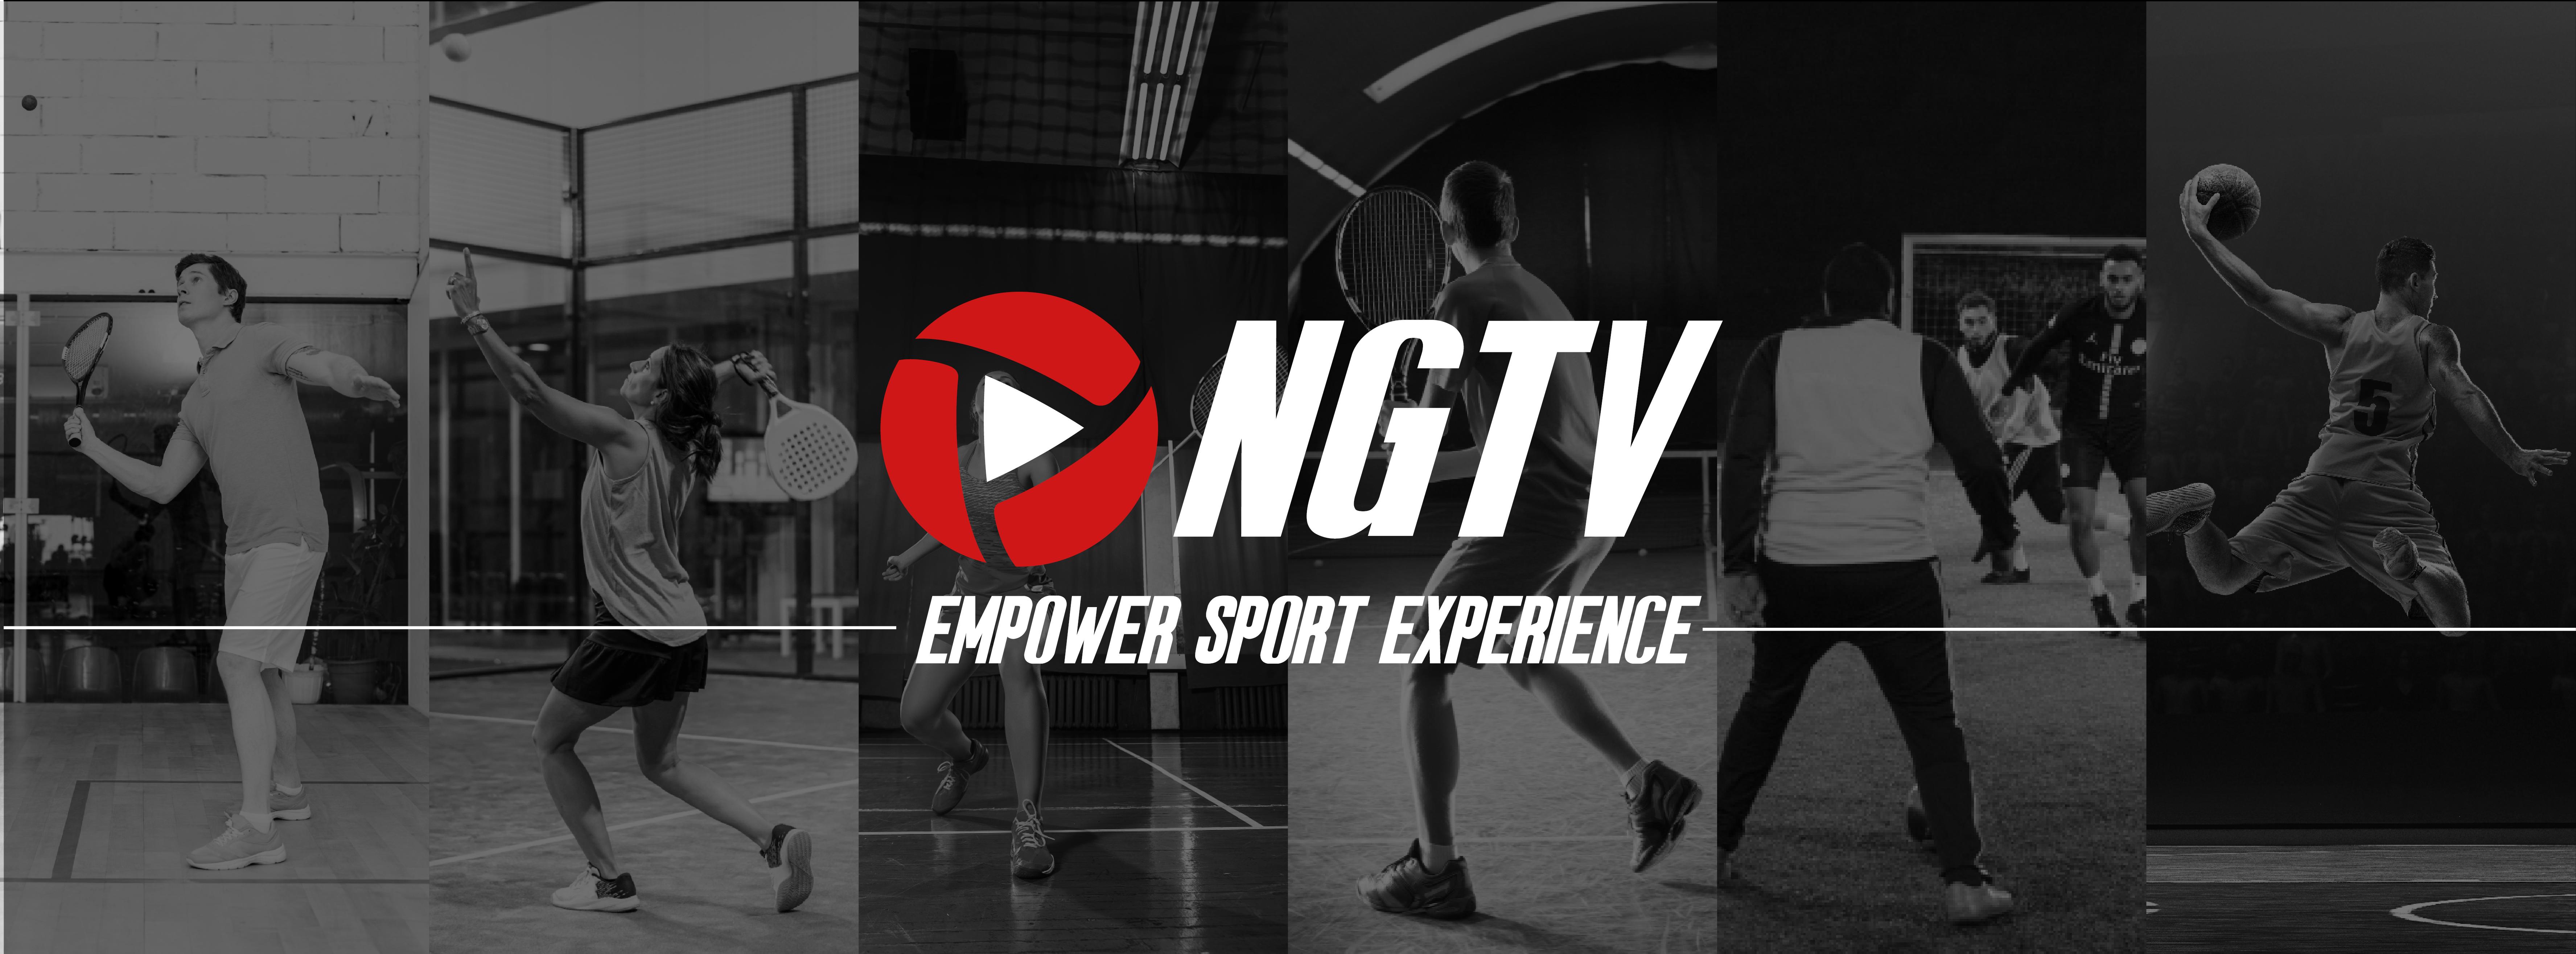 Bannière NGTV empower sport